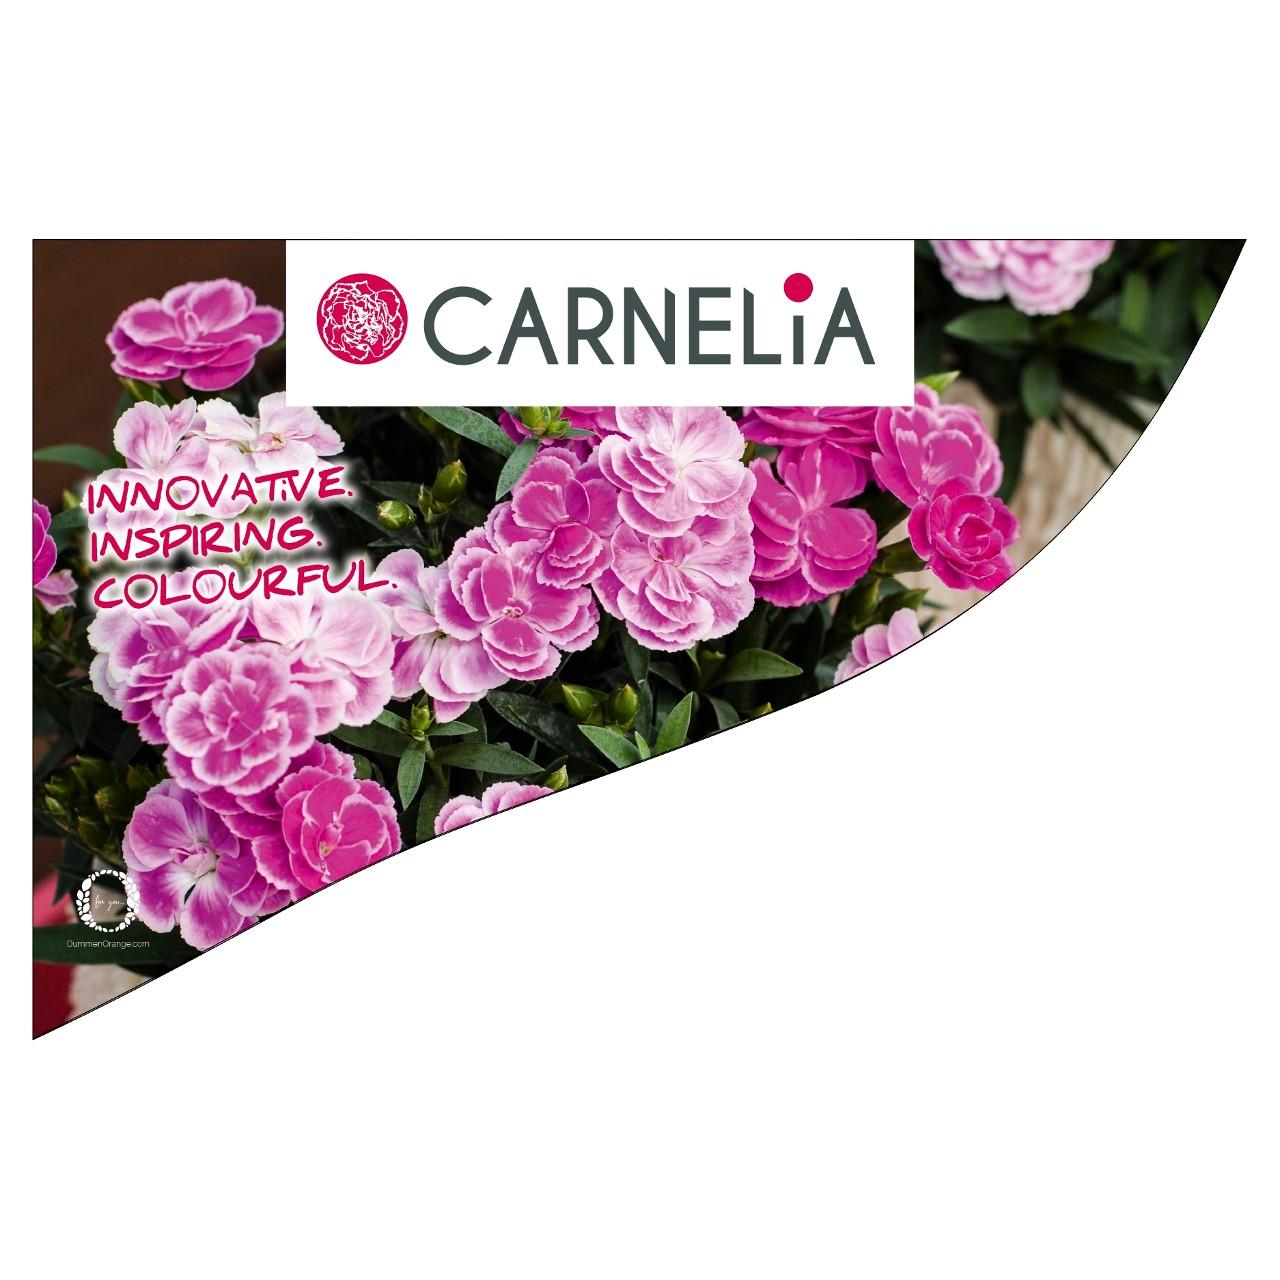 CC-Banner Carnelia 50x35 cm